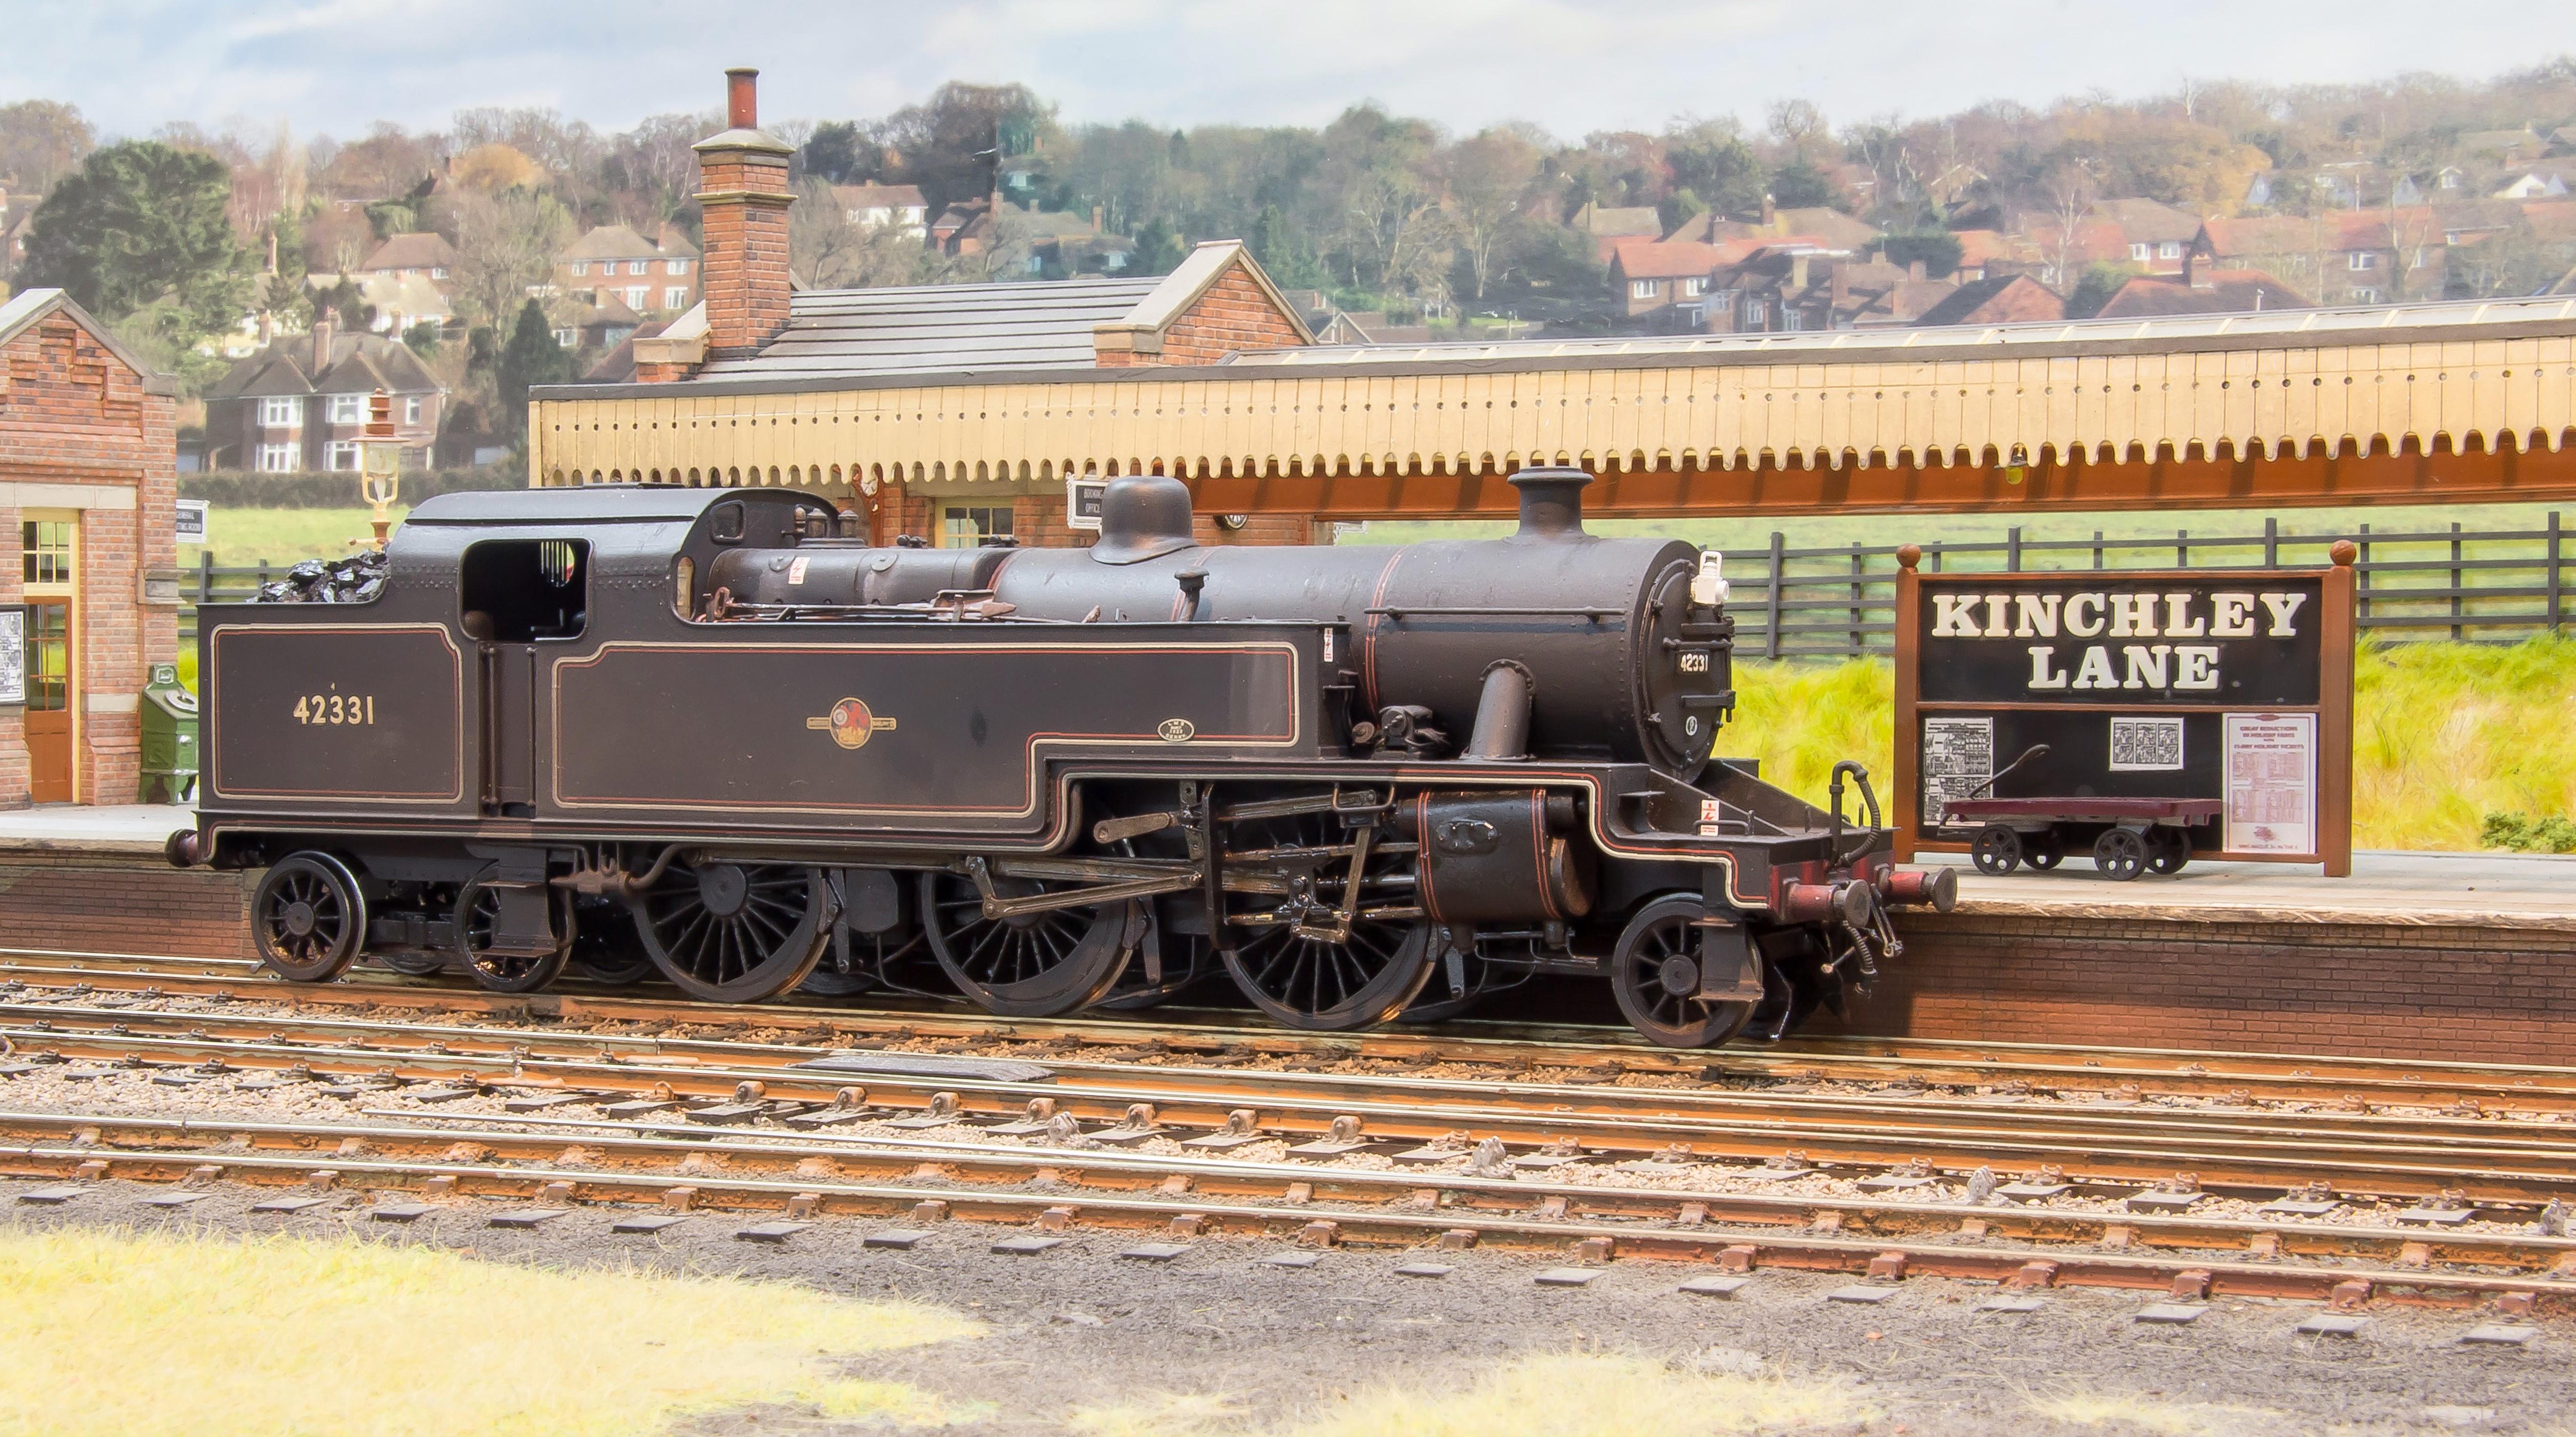 LMS Fowler class 4P 2-6-4T 42331